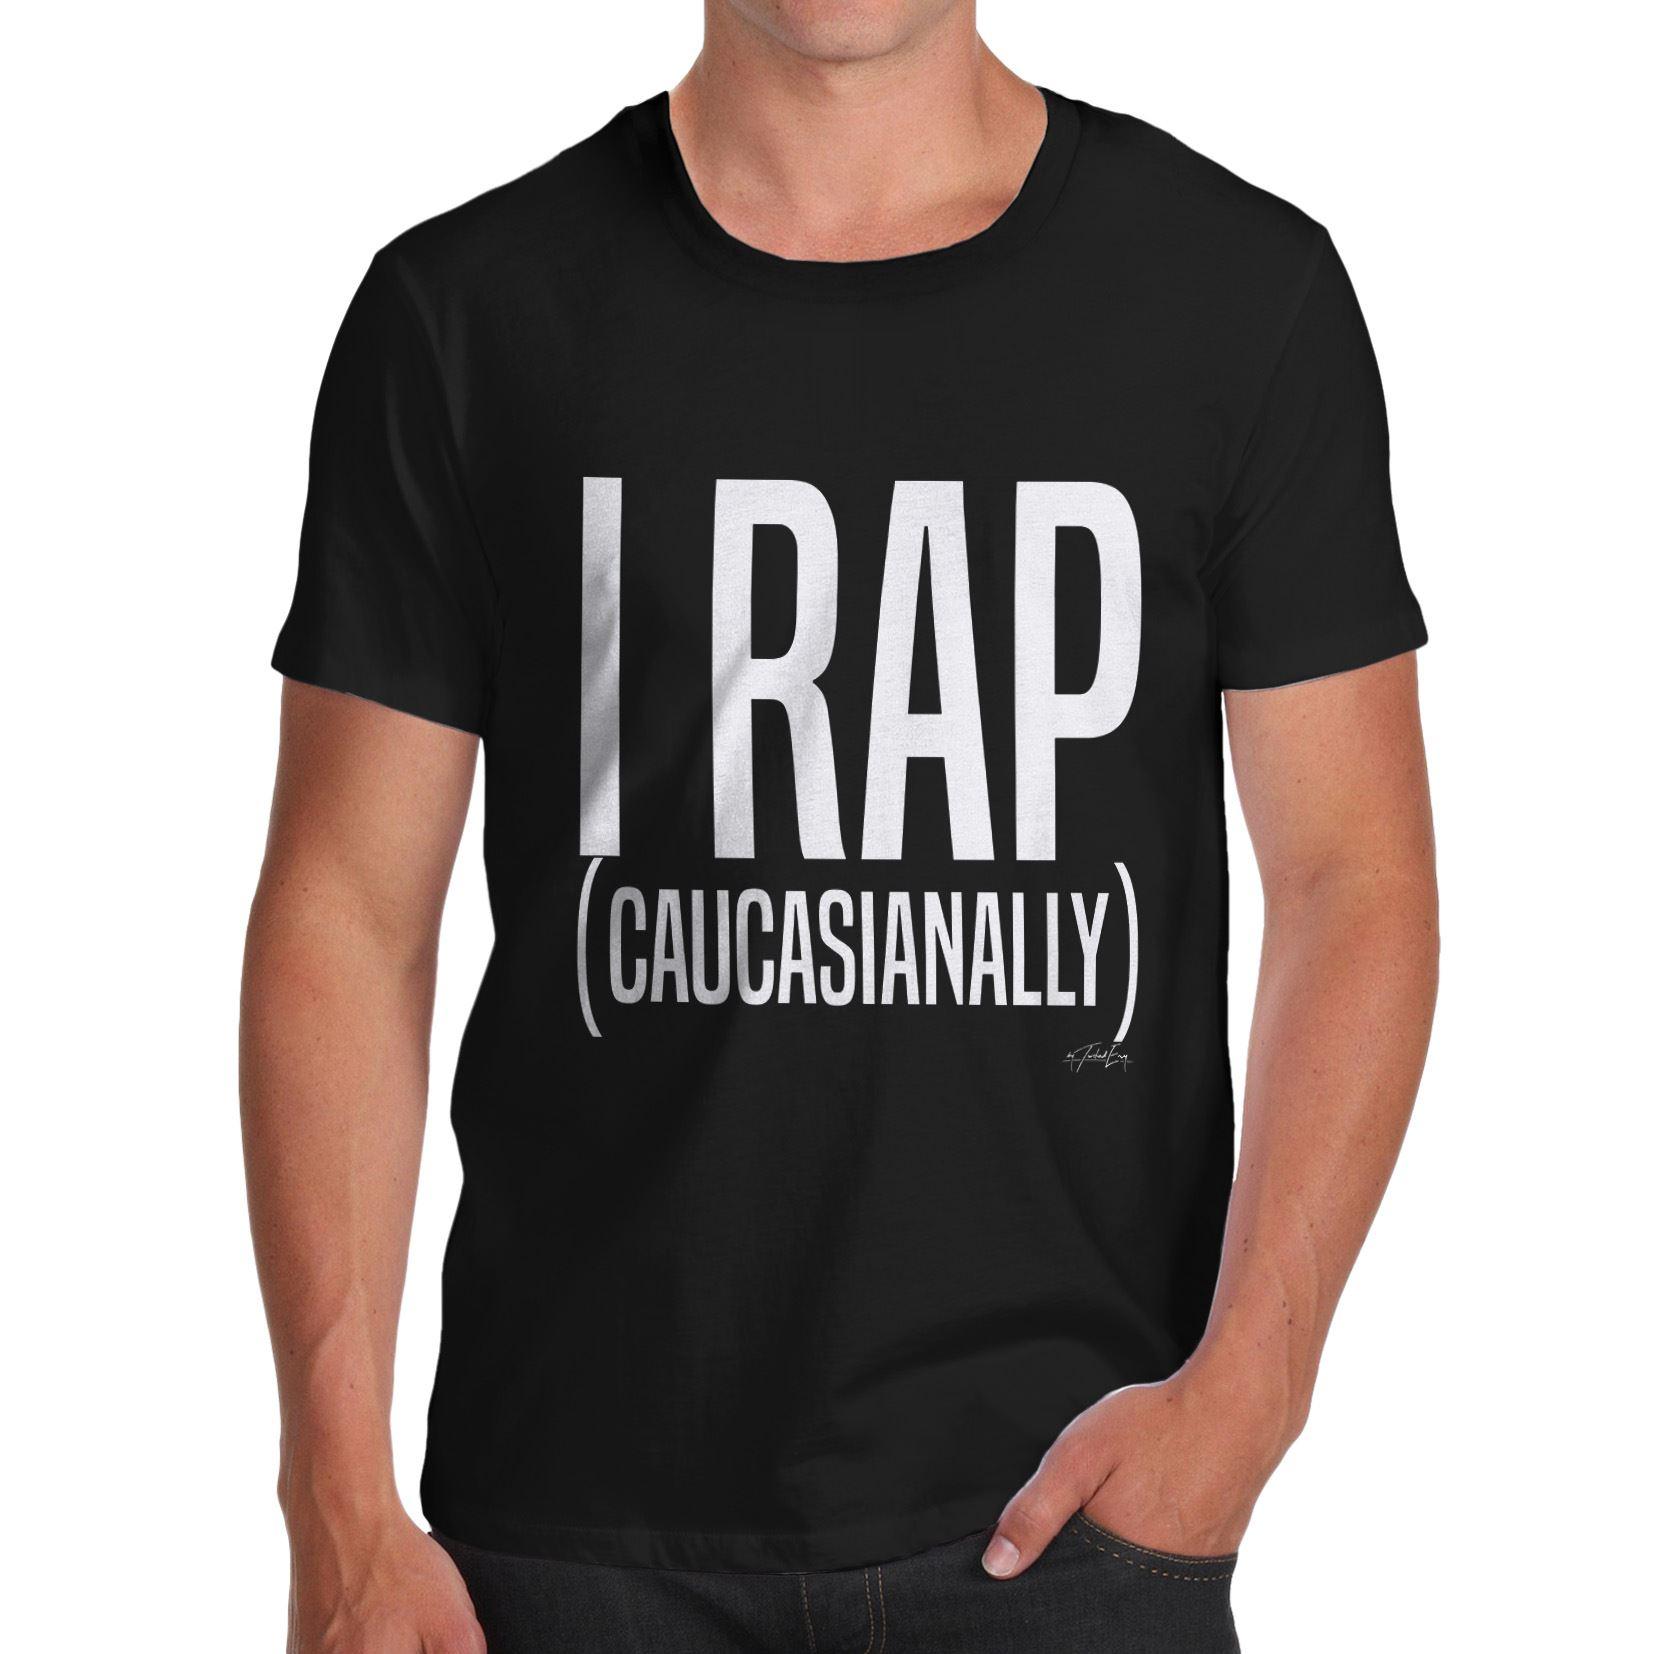 Cheap T Shirts Online Crew Neck Short I Rap Caucasianally Printing